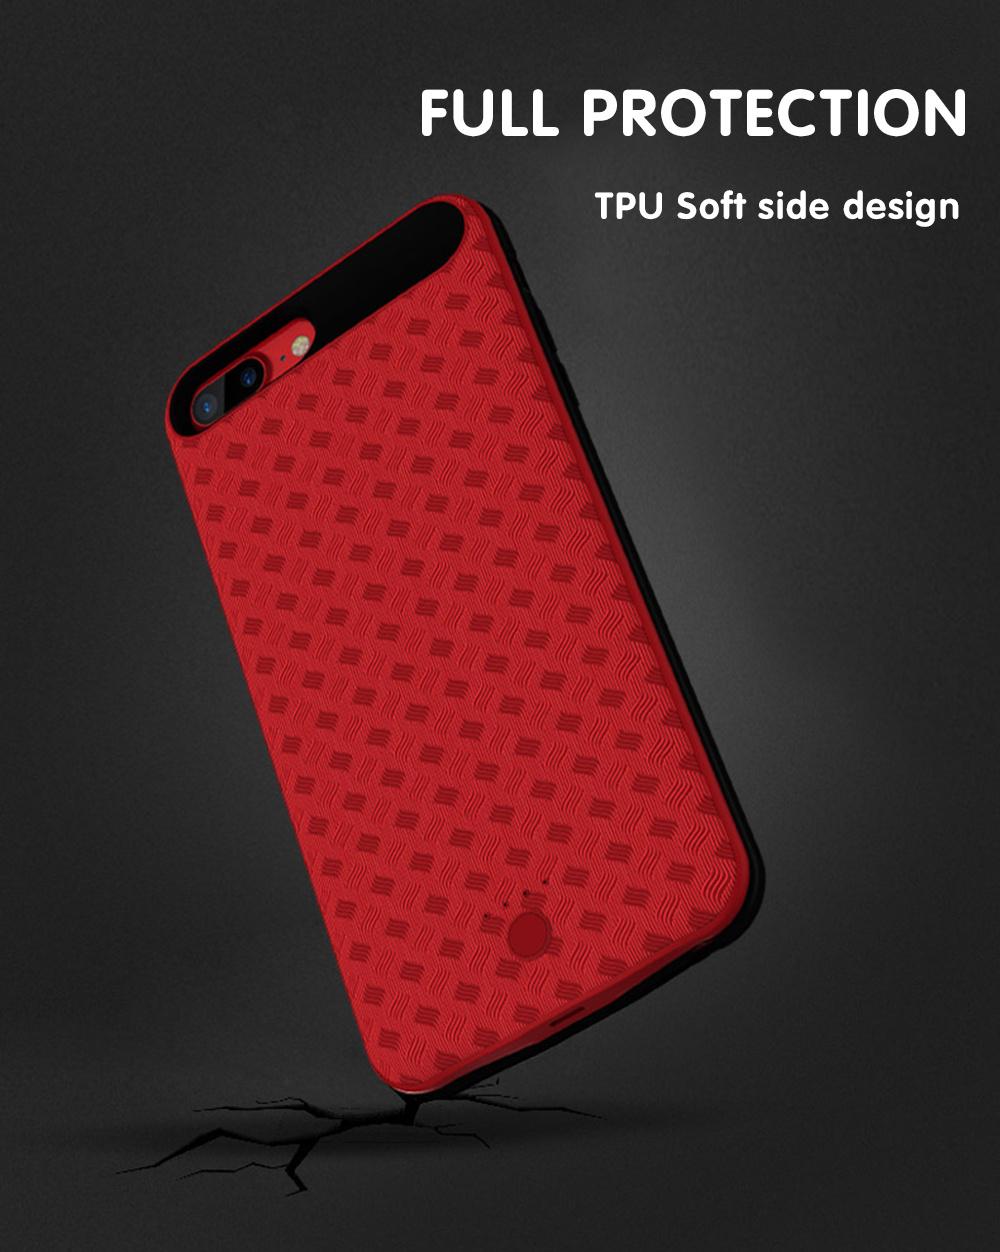 iphone 7 charging case